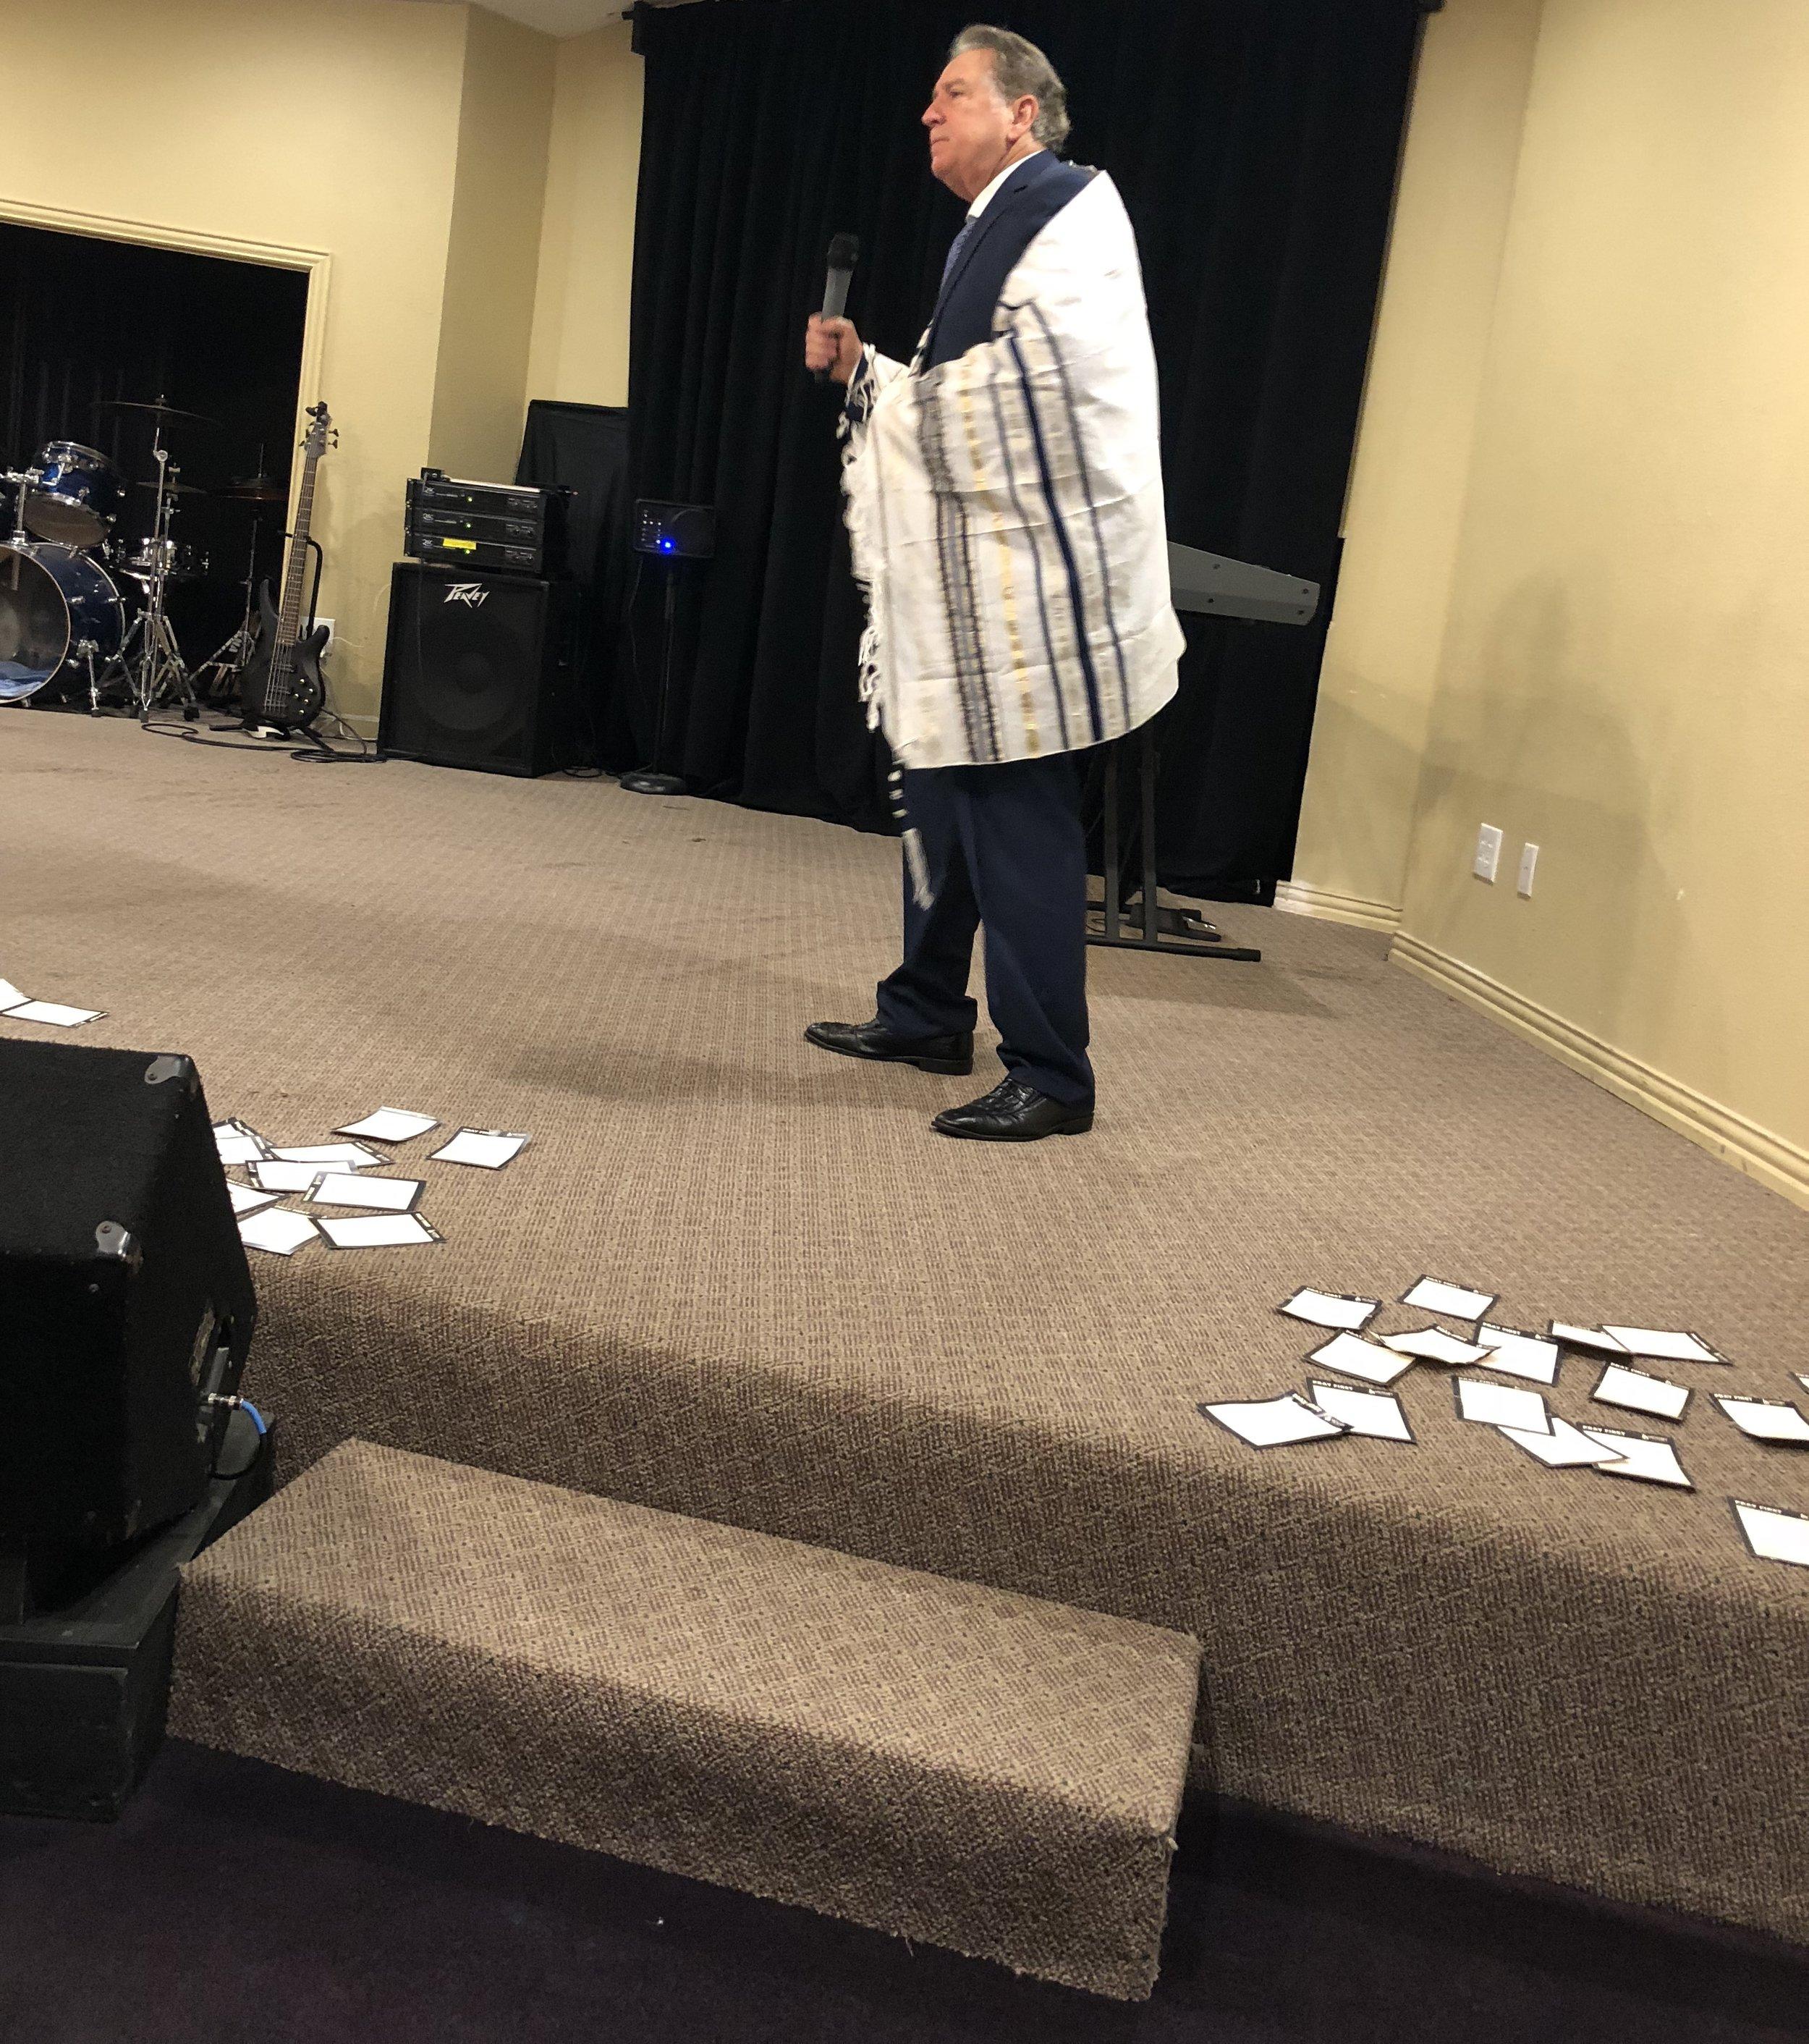 Corinth, Texas; Winslow preaching with prayer shawl.